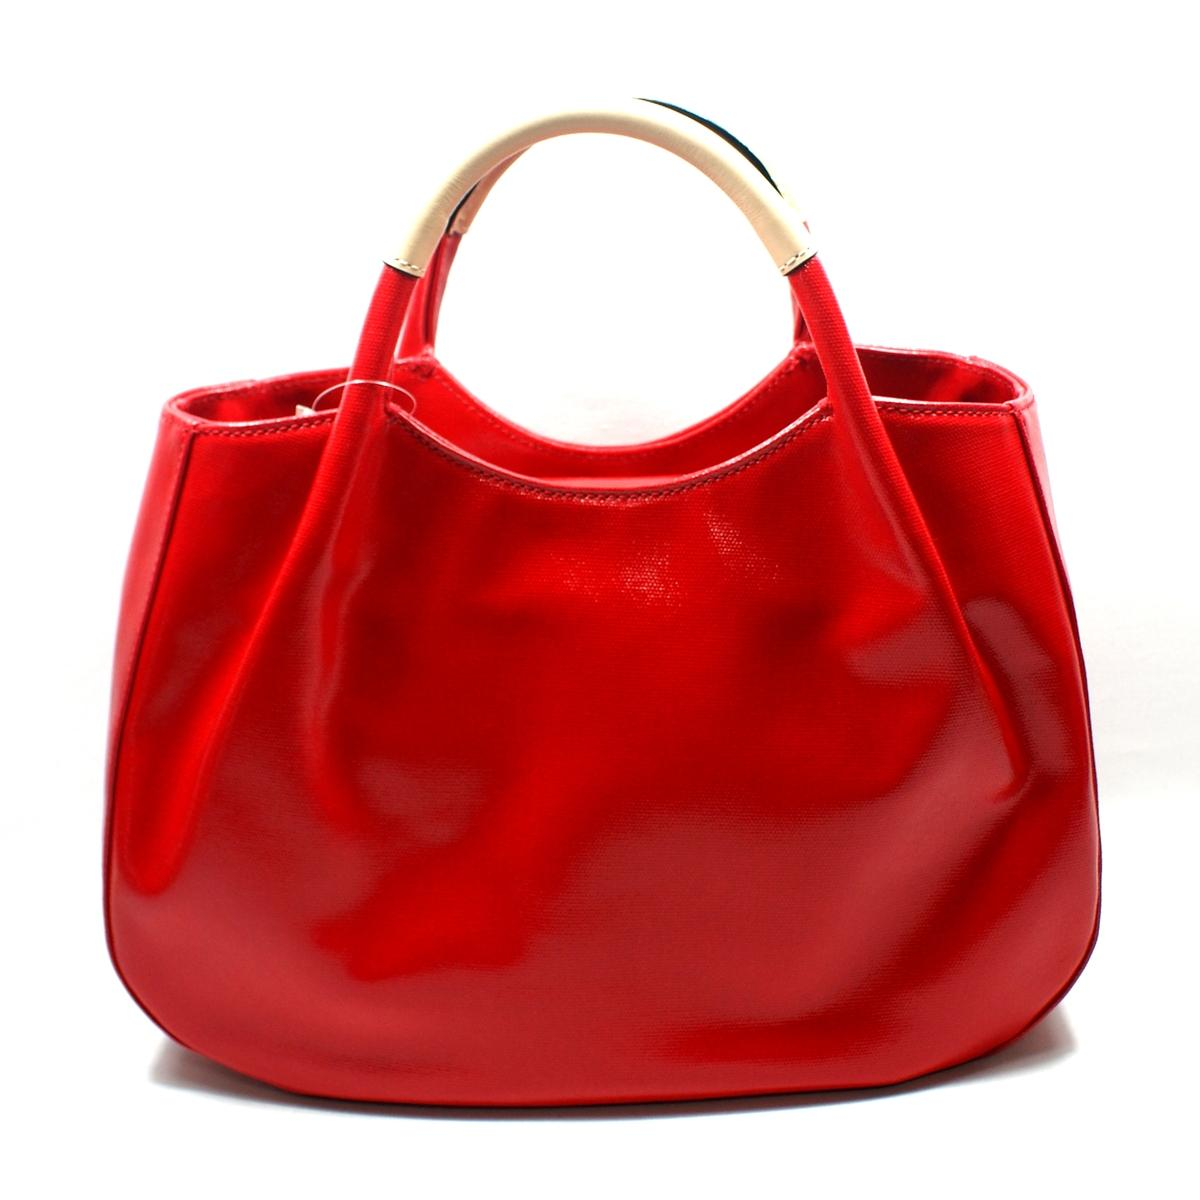 kate spade treesh fulton street black handbag red